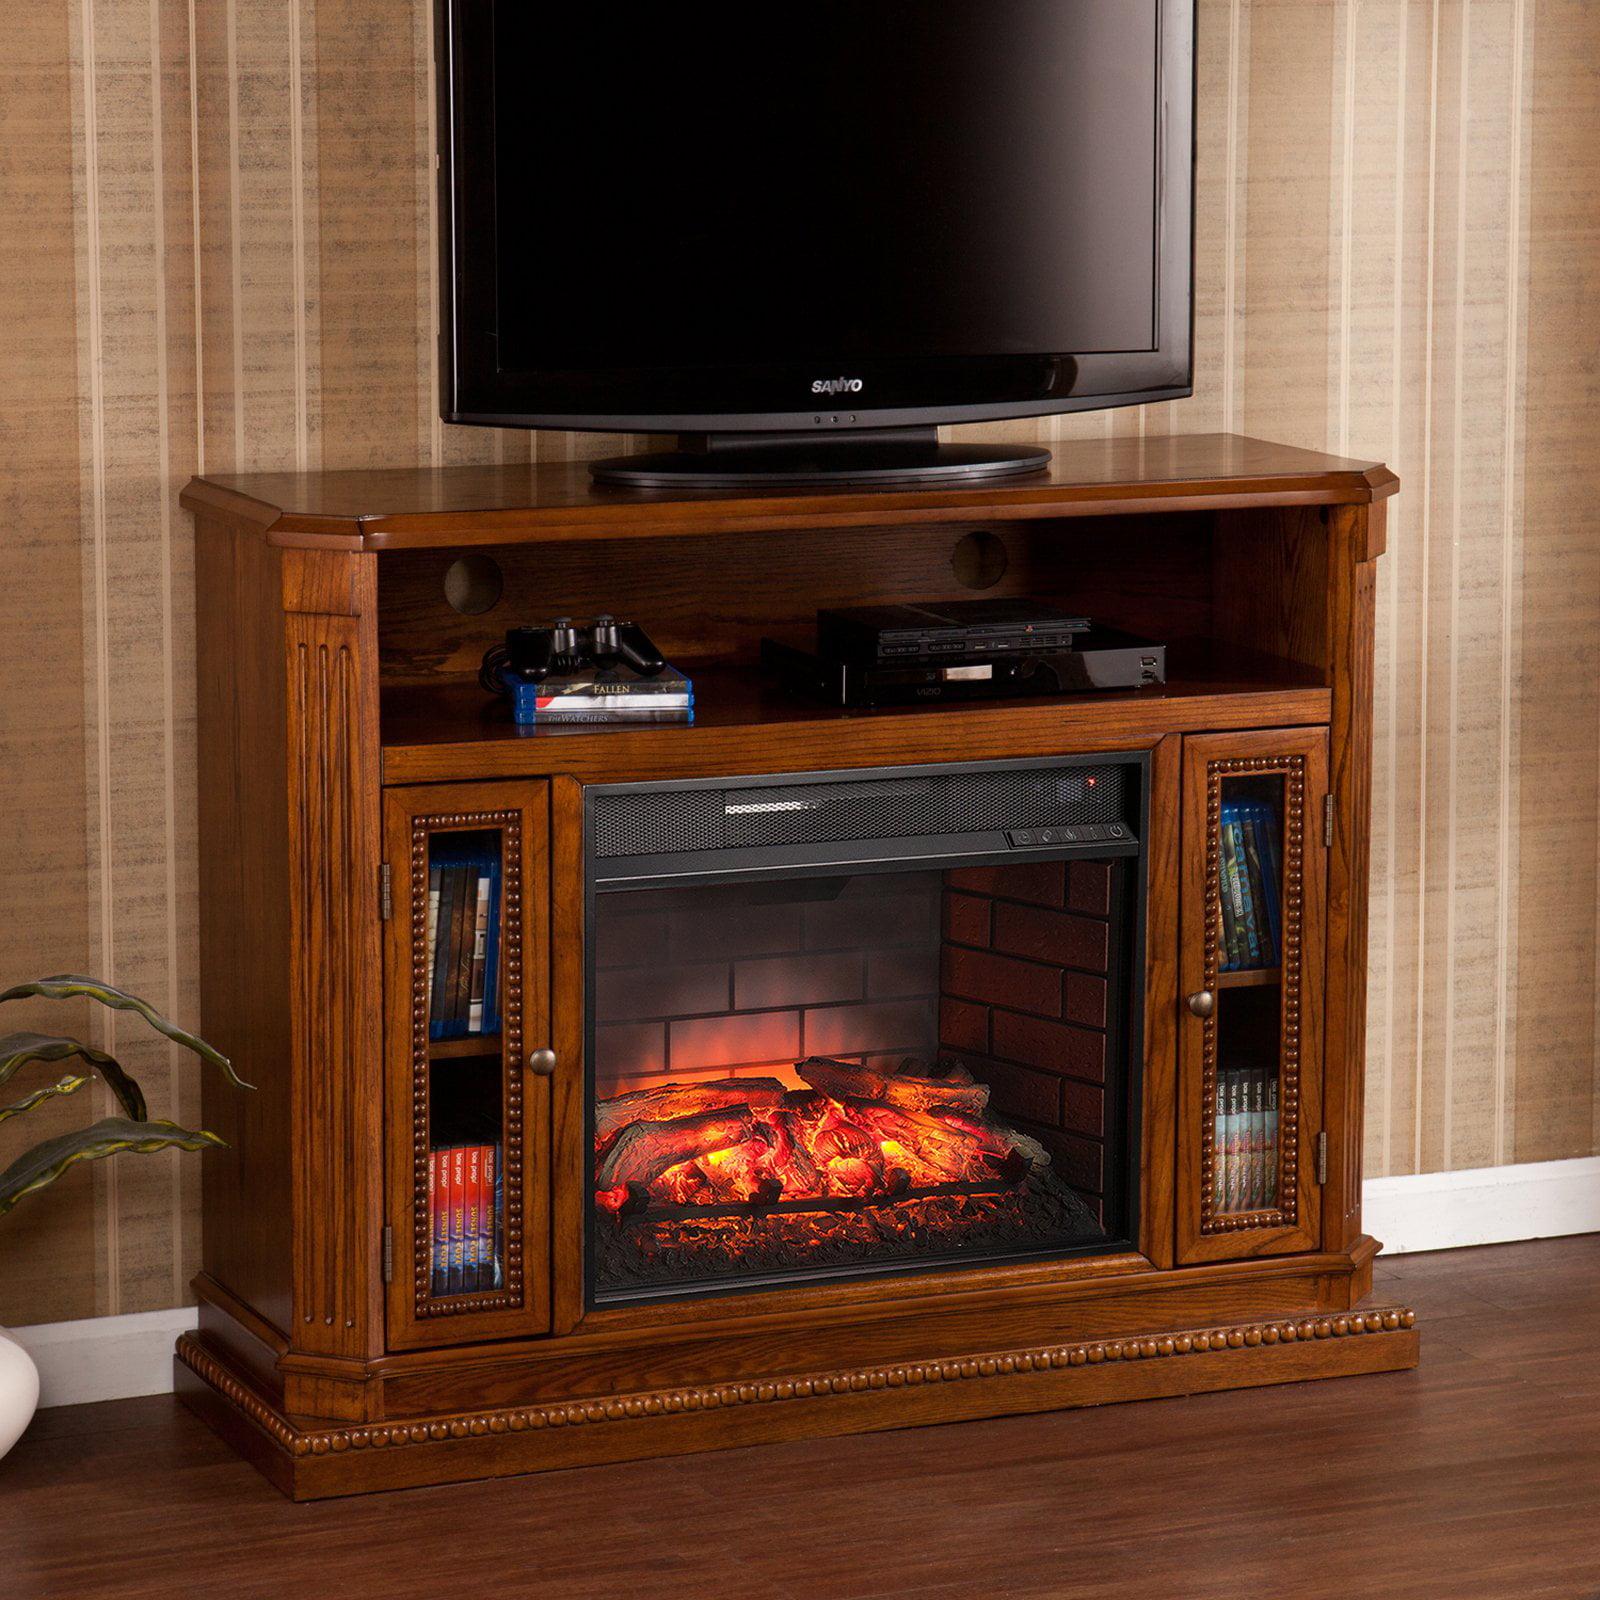 Southern Enterprises Atkinson Infrared Electric Media Fireplace